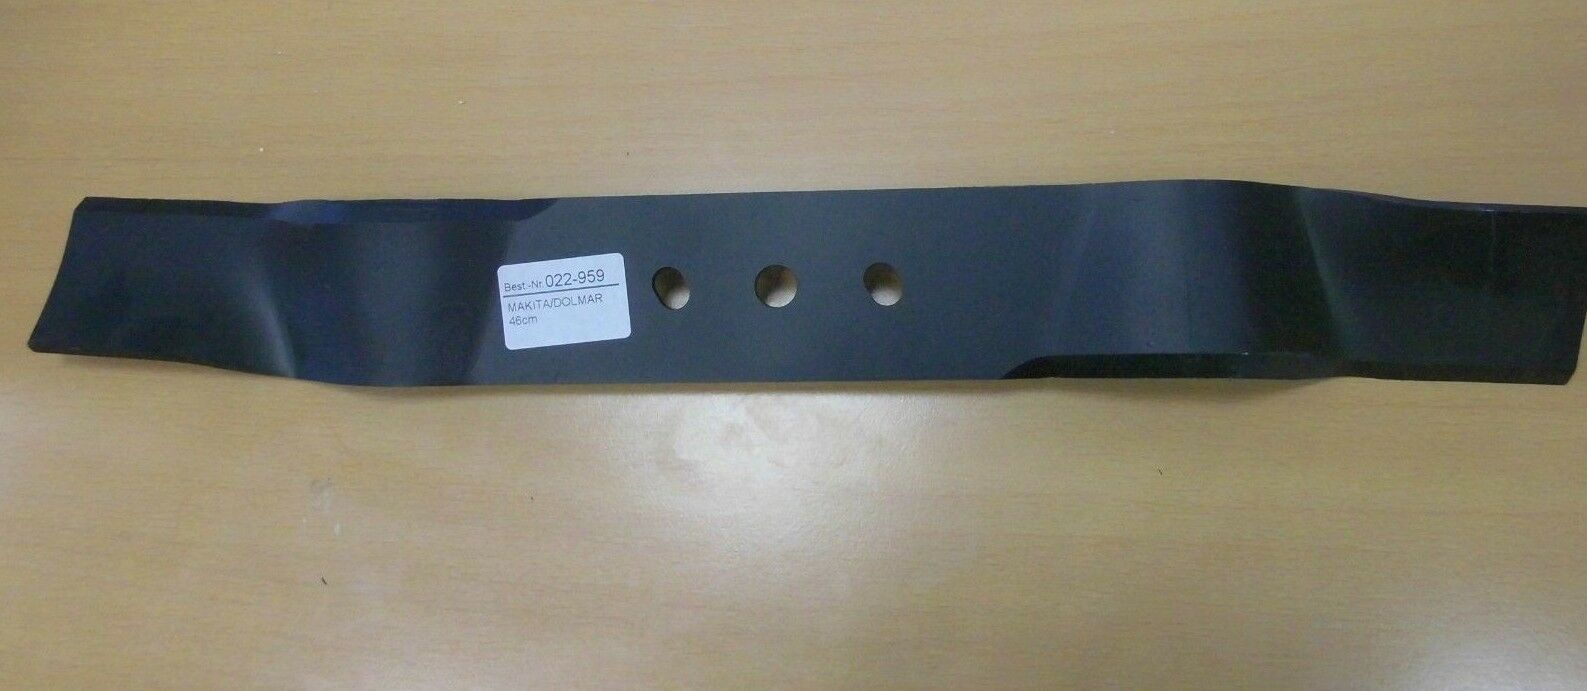 Ranger 2 H MTD Rasenmäher Messer Ersatzmesser für MF 42-22 SD Ranger 3